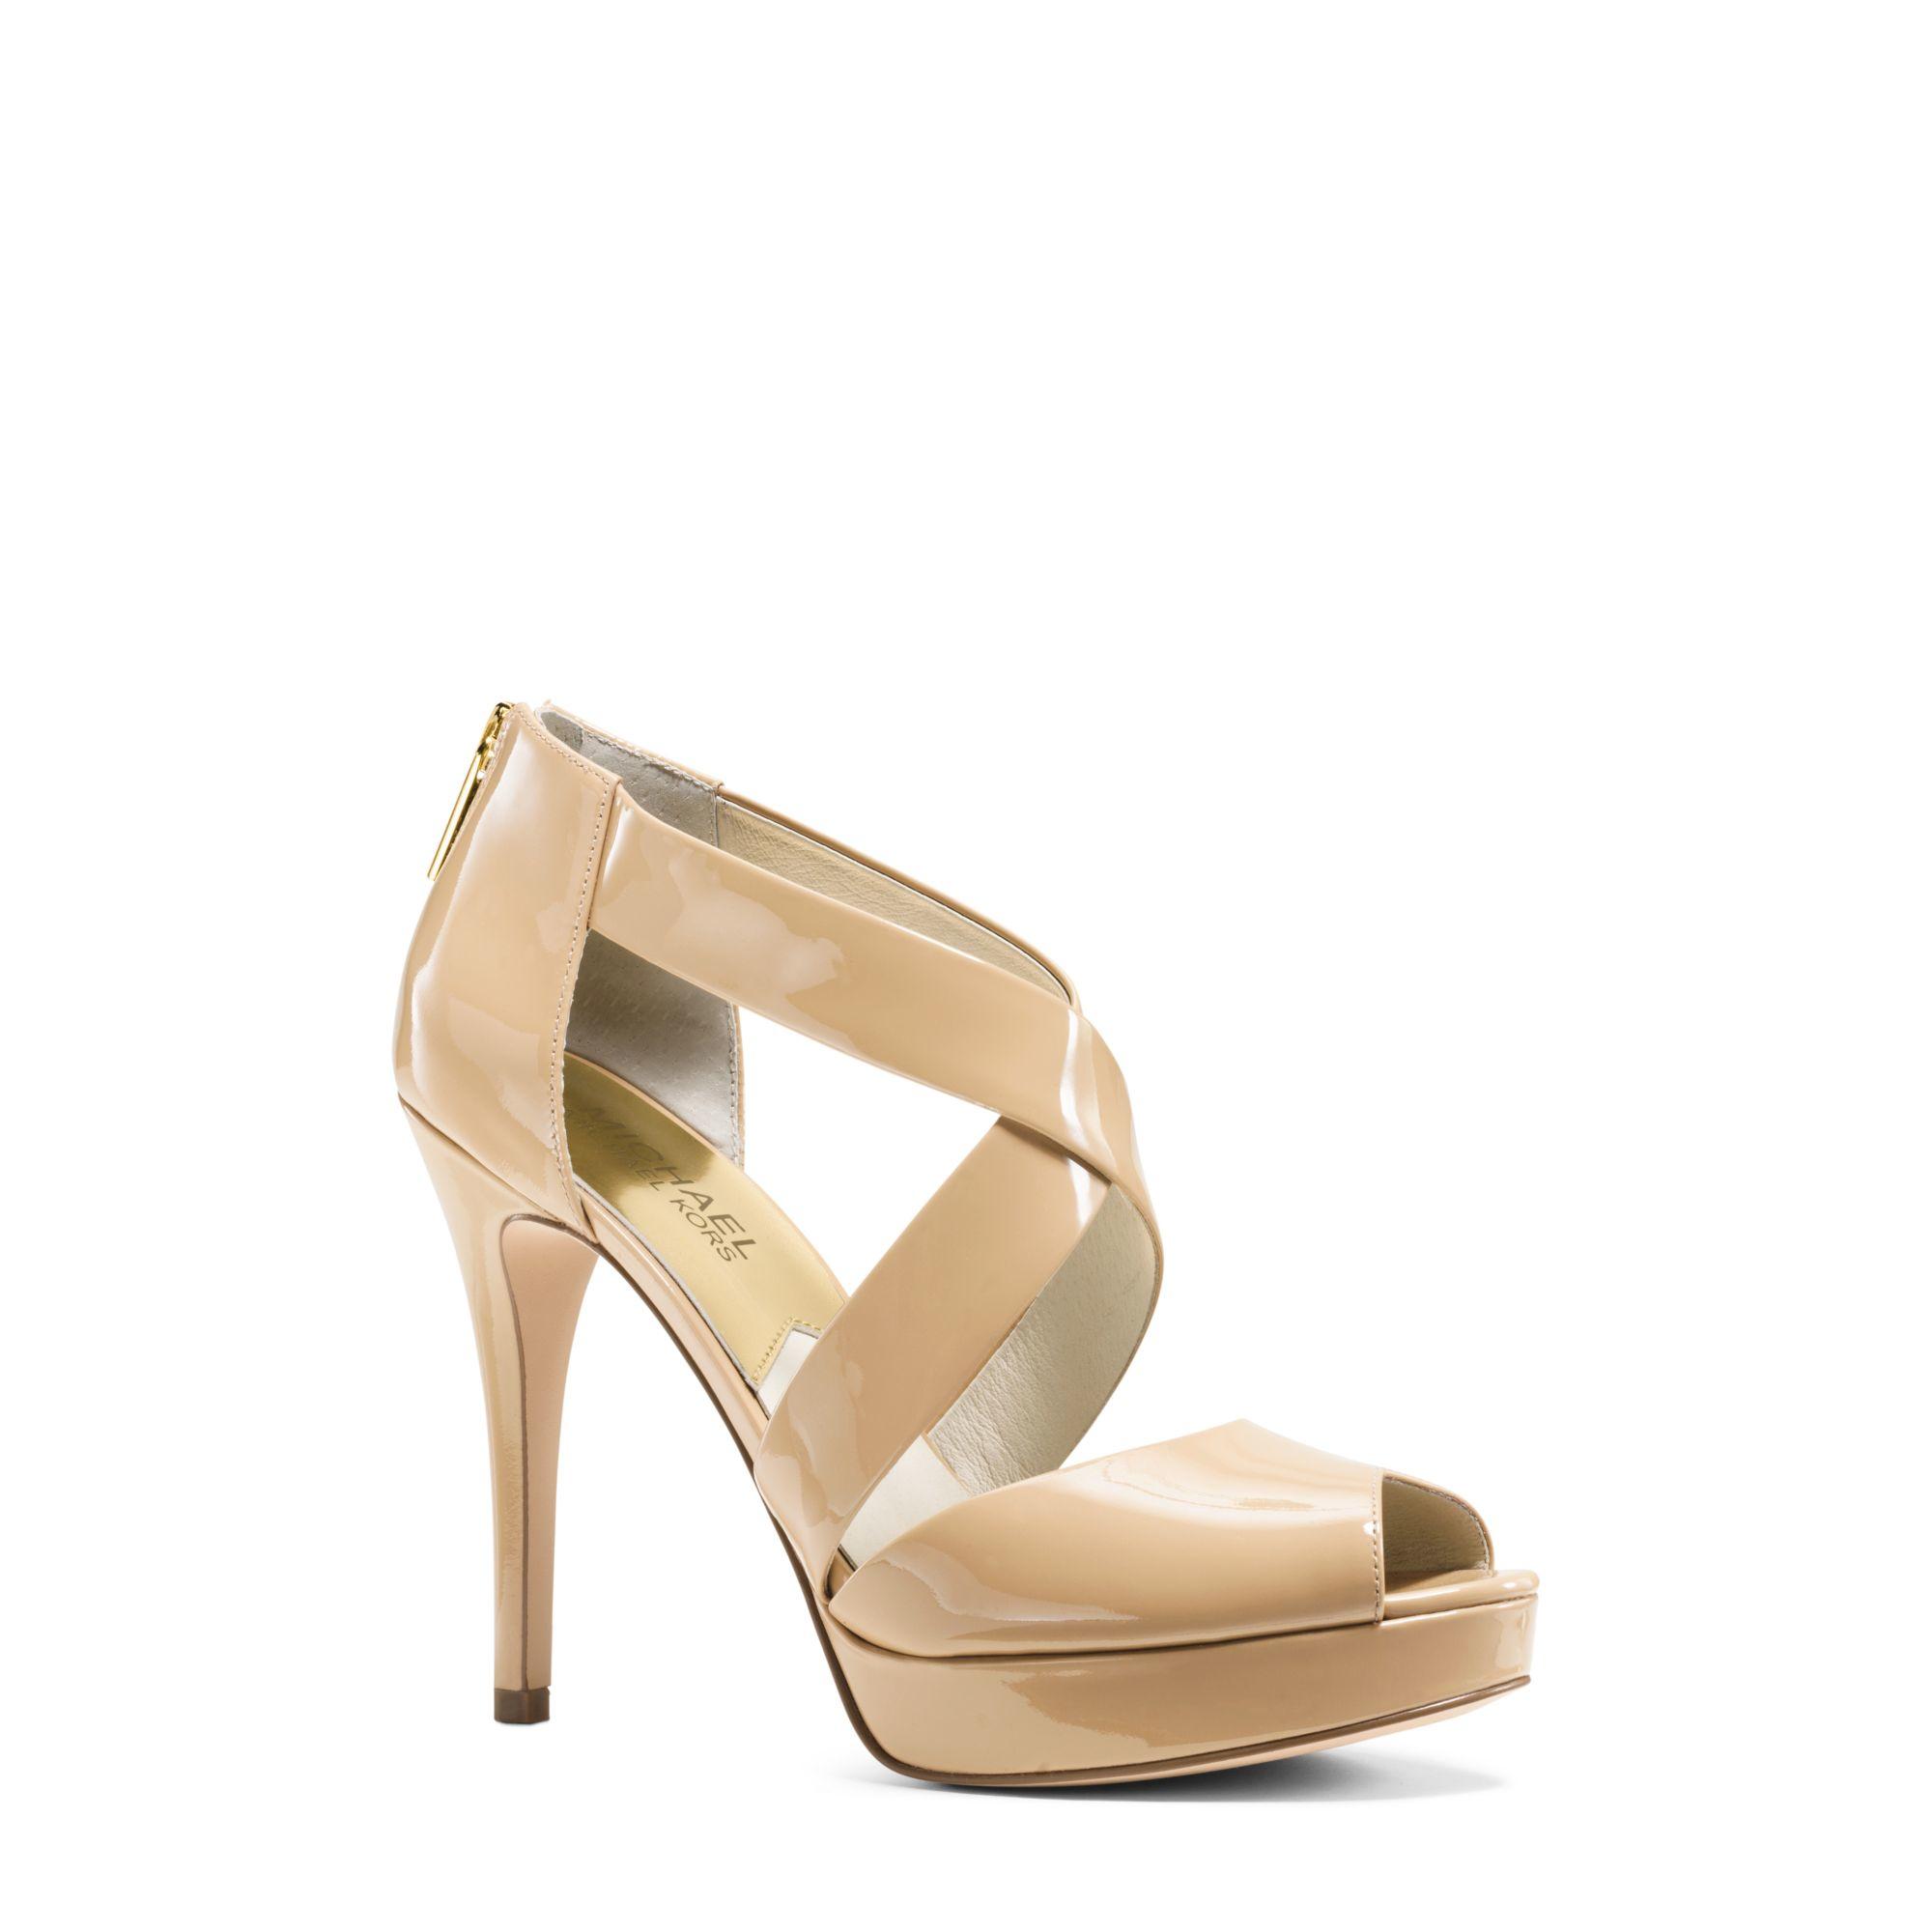 812a27797c8 Lyst - Michael Kors Ariel Patent-leather Platform Sandal in Natural